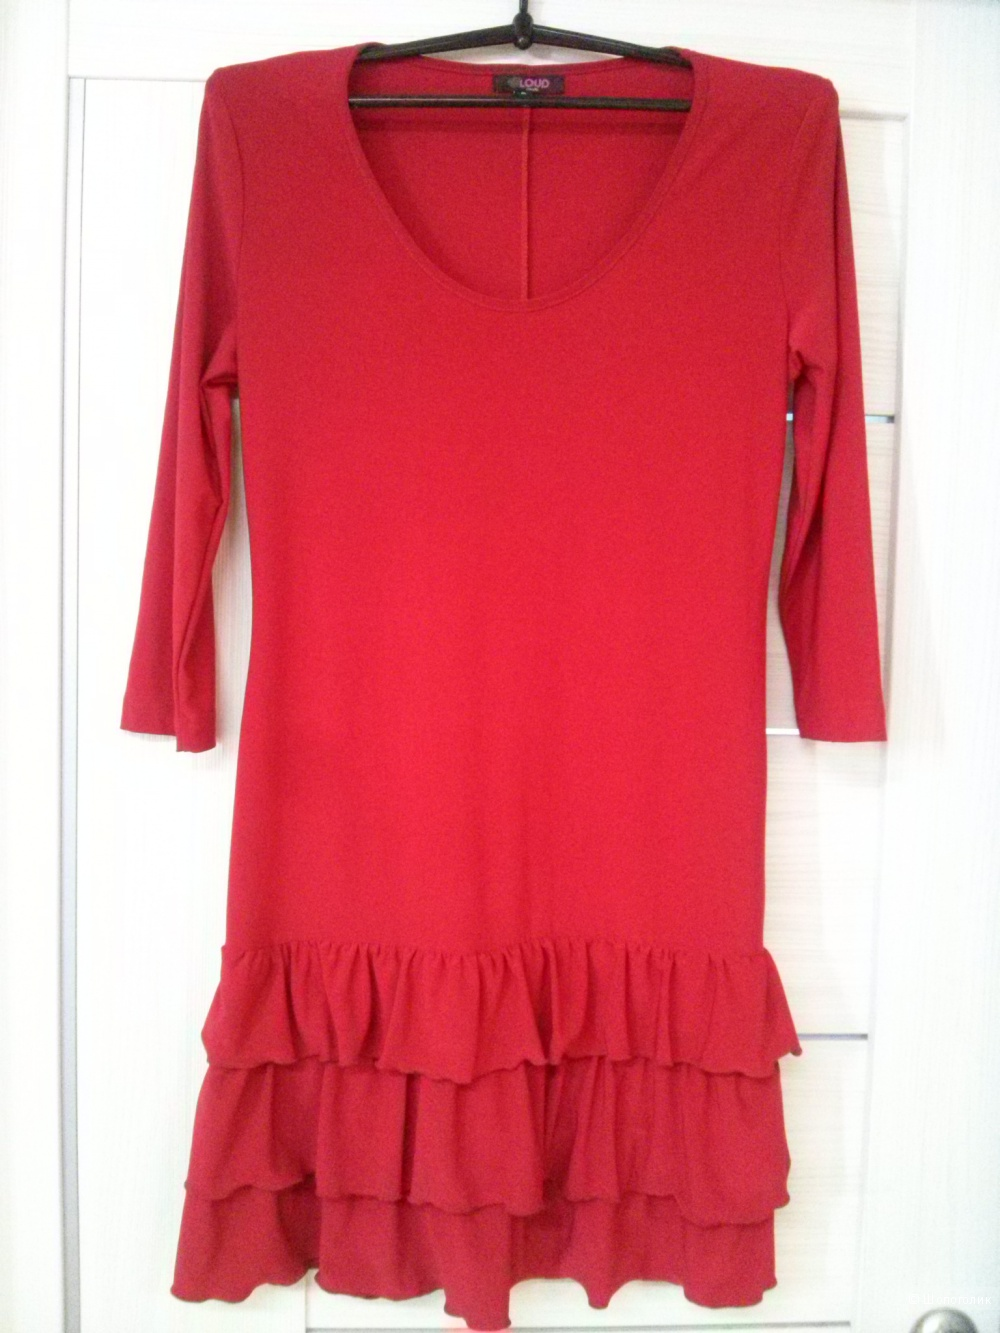 Красное платье -туника, размер S.